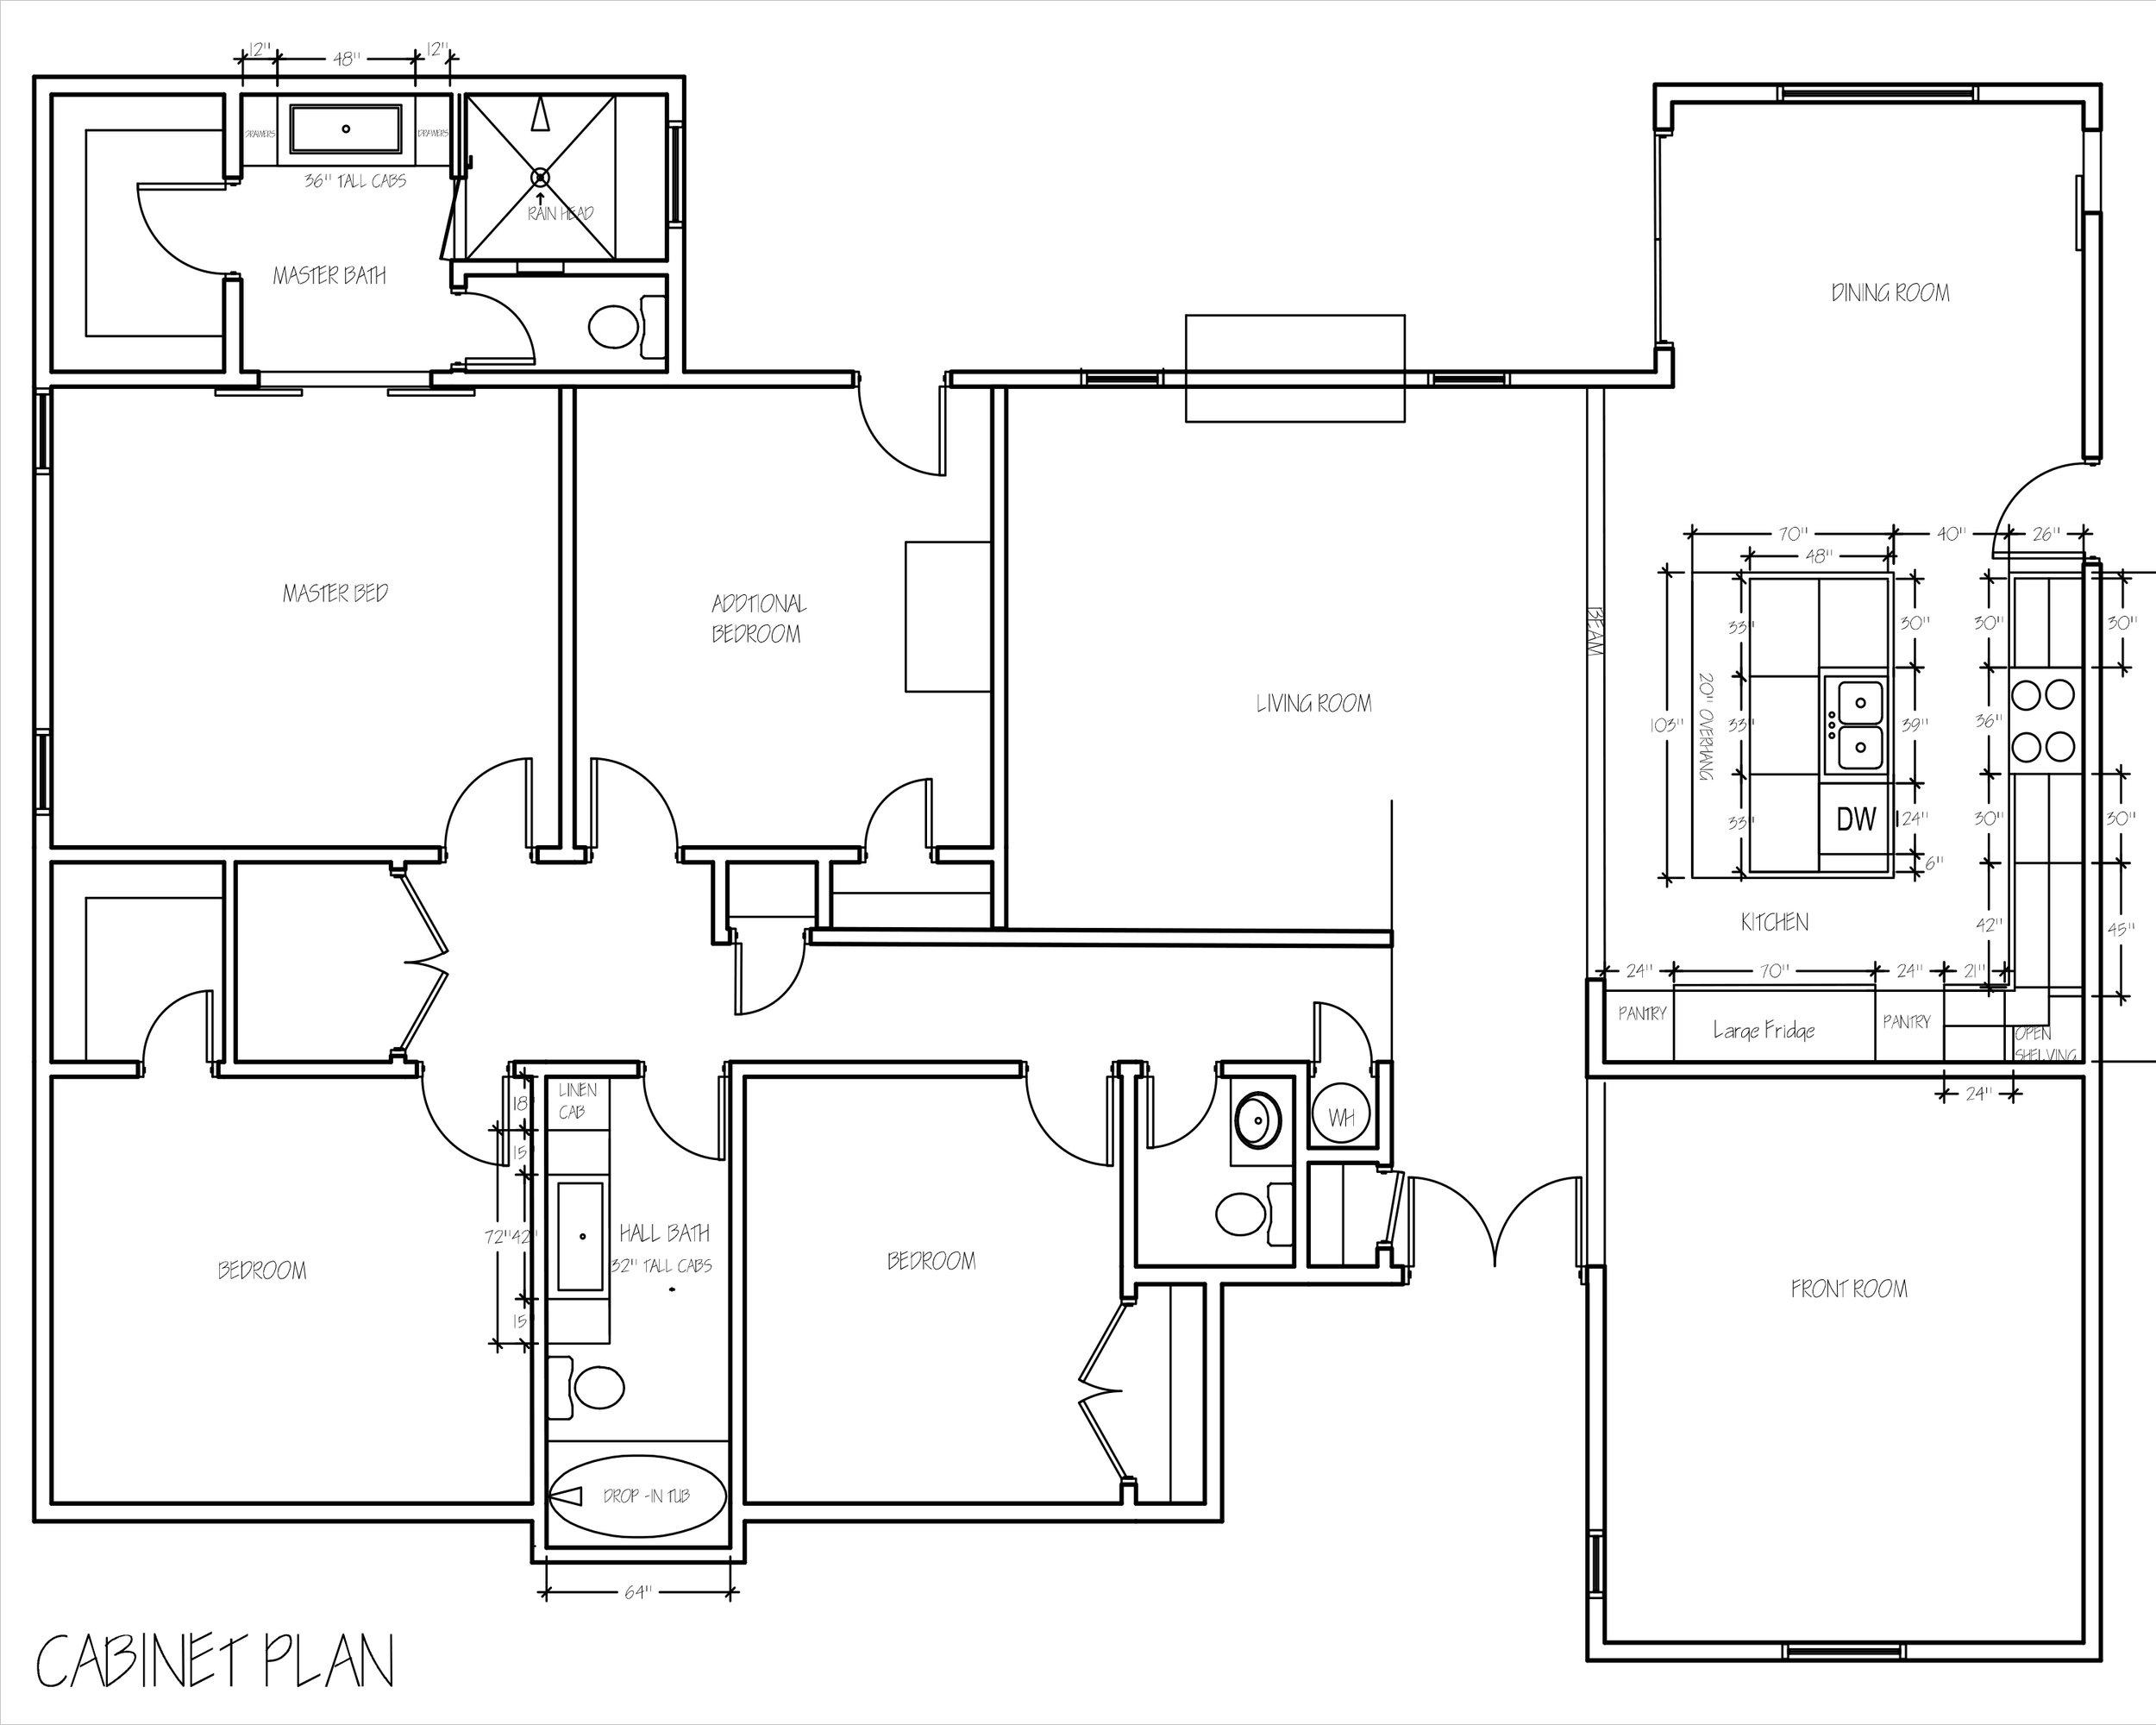 Sonoran Desert Living Voltair Cabinet Plan.jpg